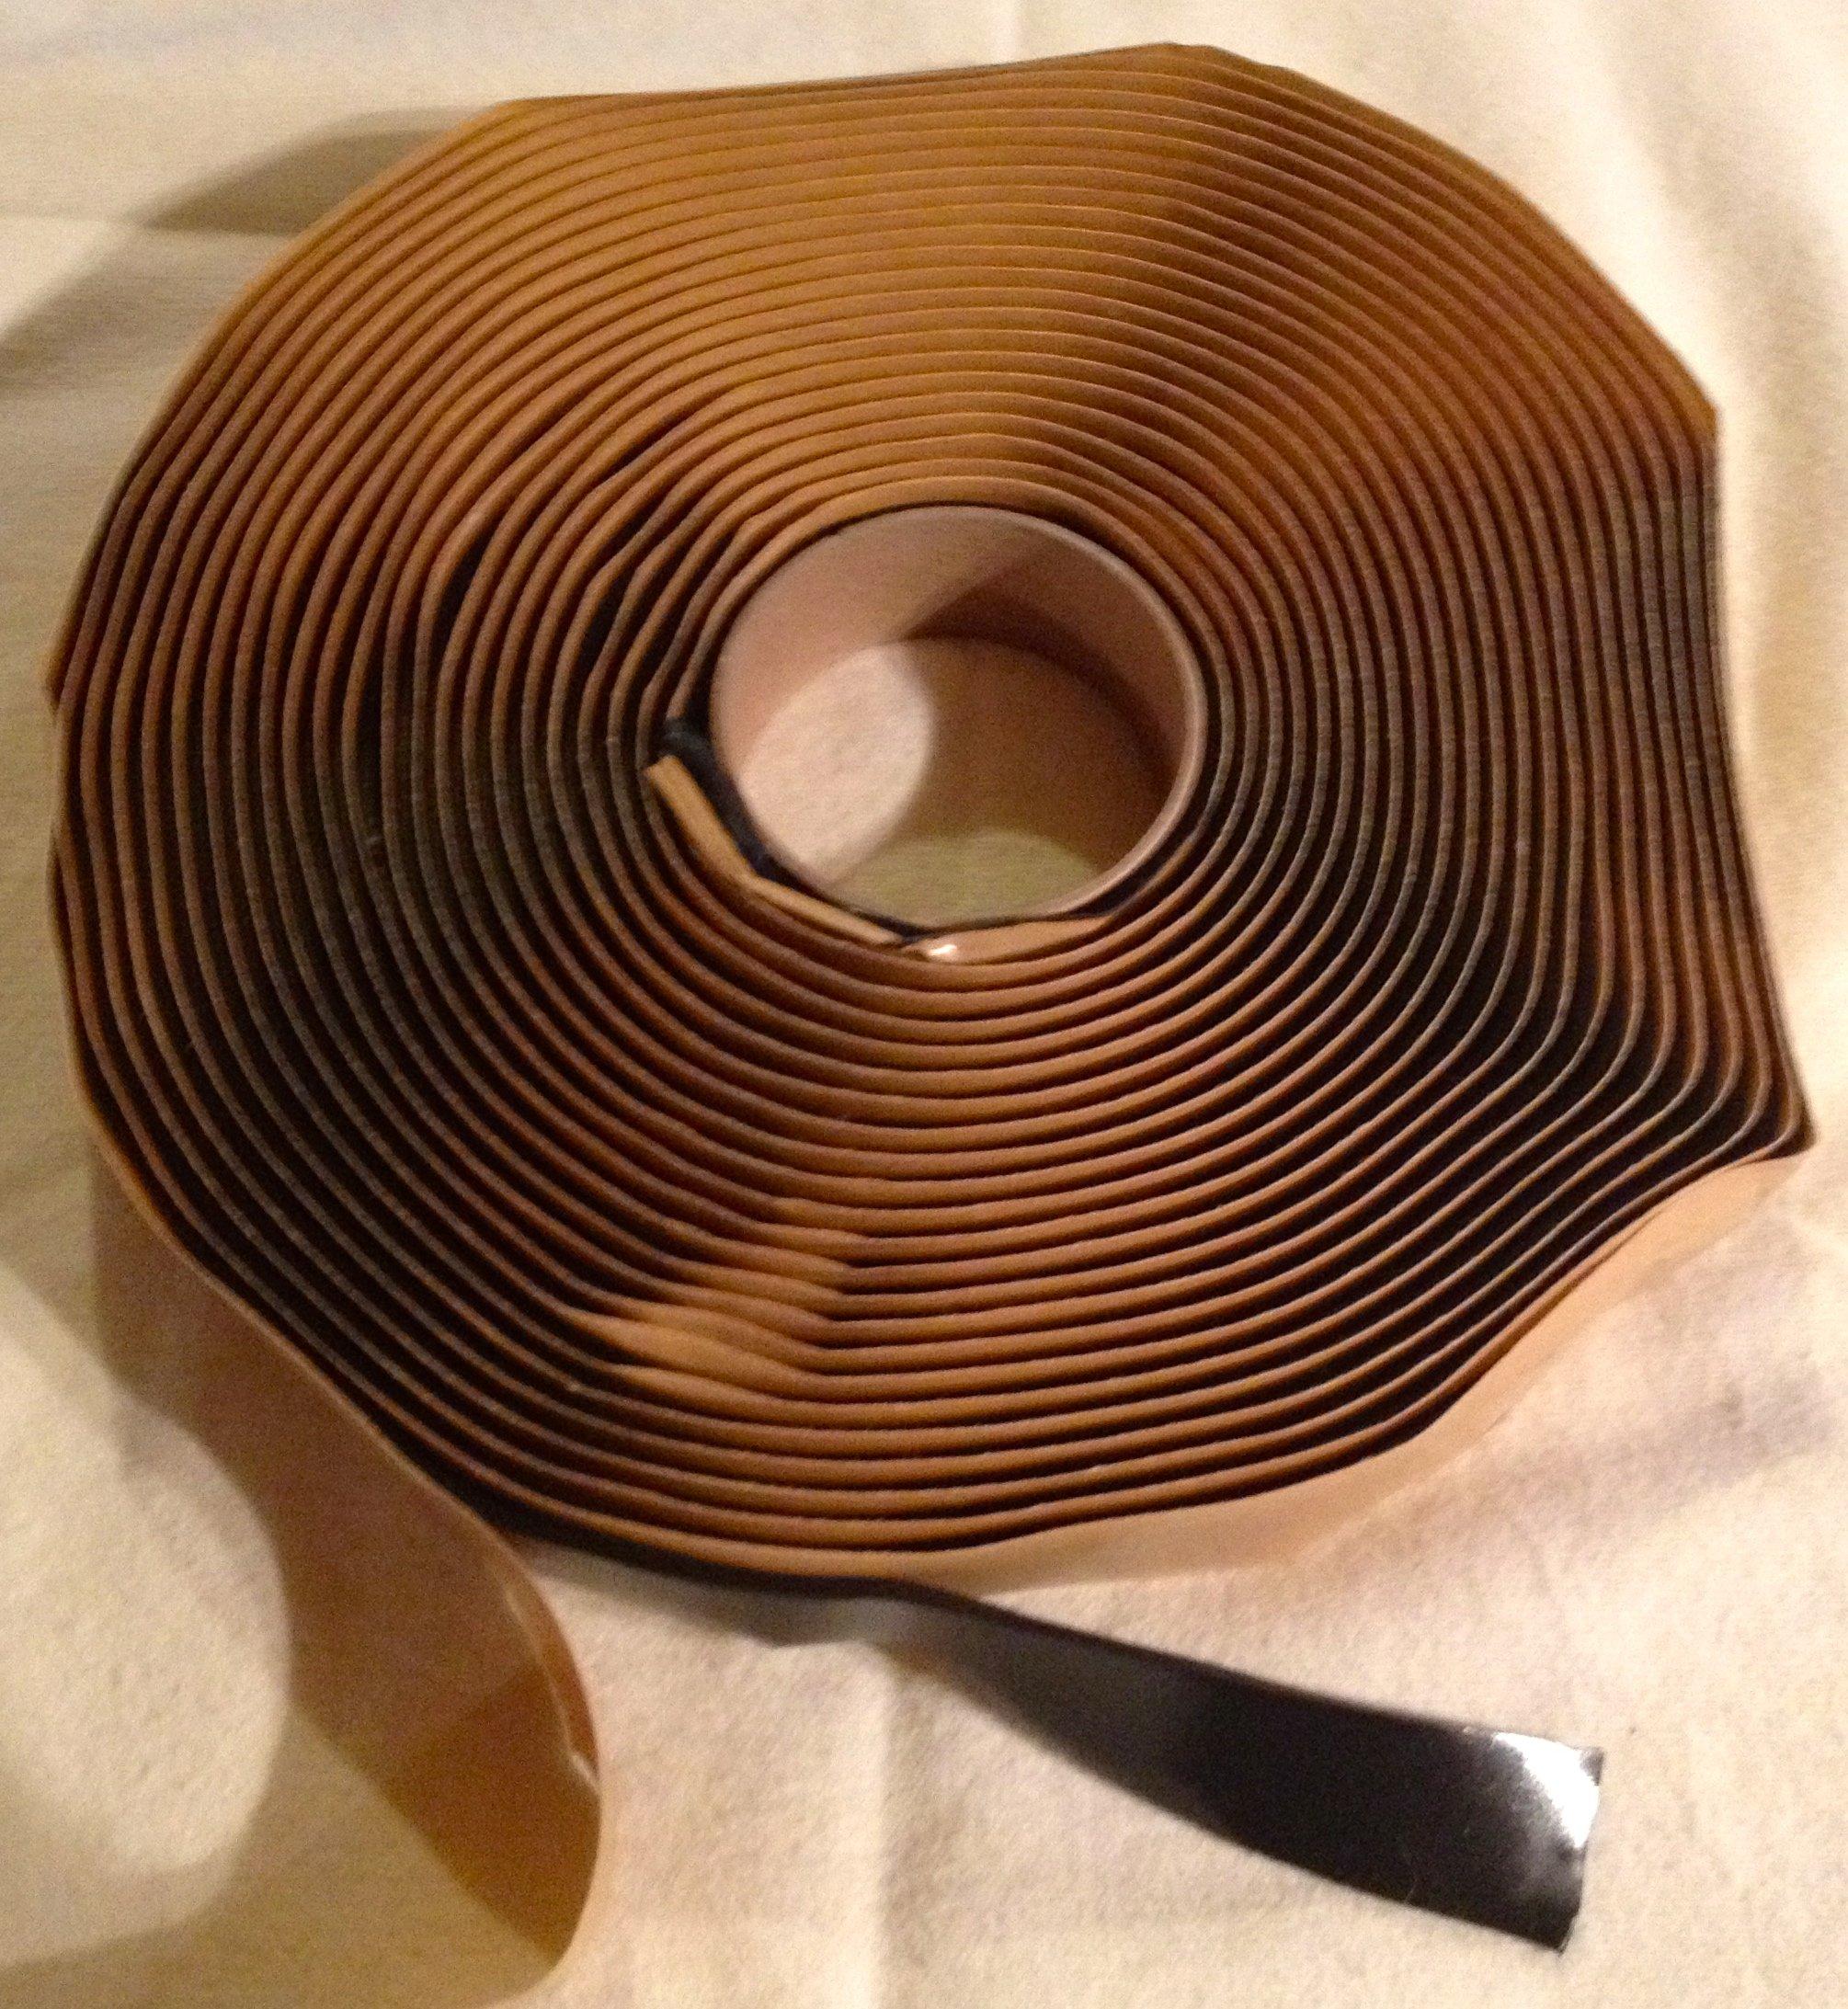 Colorimetrics Black Putty Tape / Butyl Tape 1/8'' x 3/4'' x 30' by DEHCO